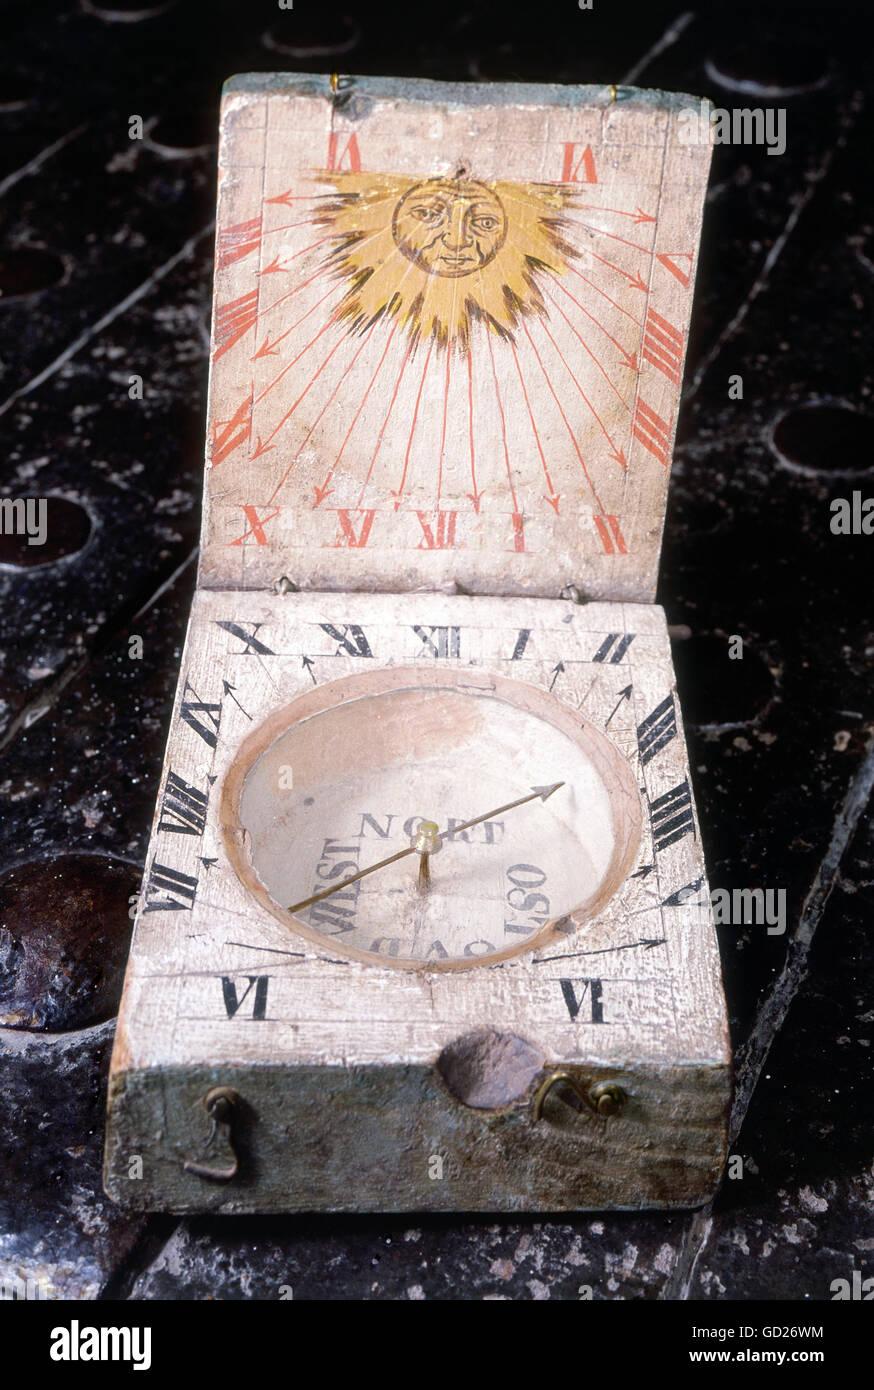 clocks, sundials, compass, horizontal sundial, wood, Tyrol, late 16th century, Bregenz State Museum, historic, historical, Stock Photo